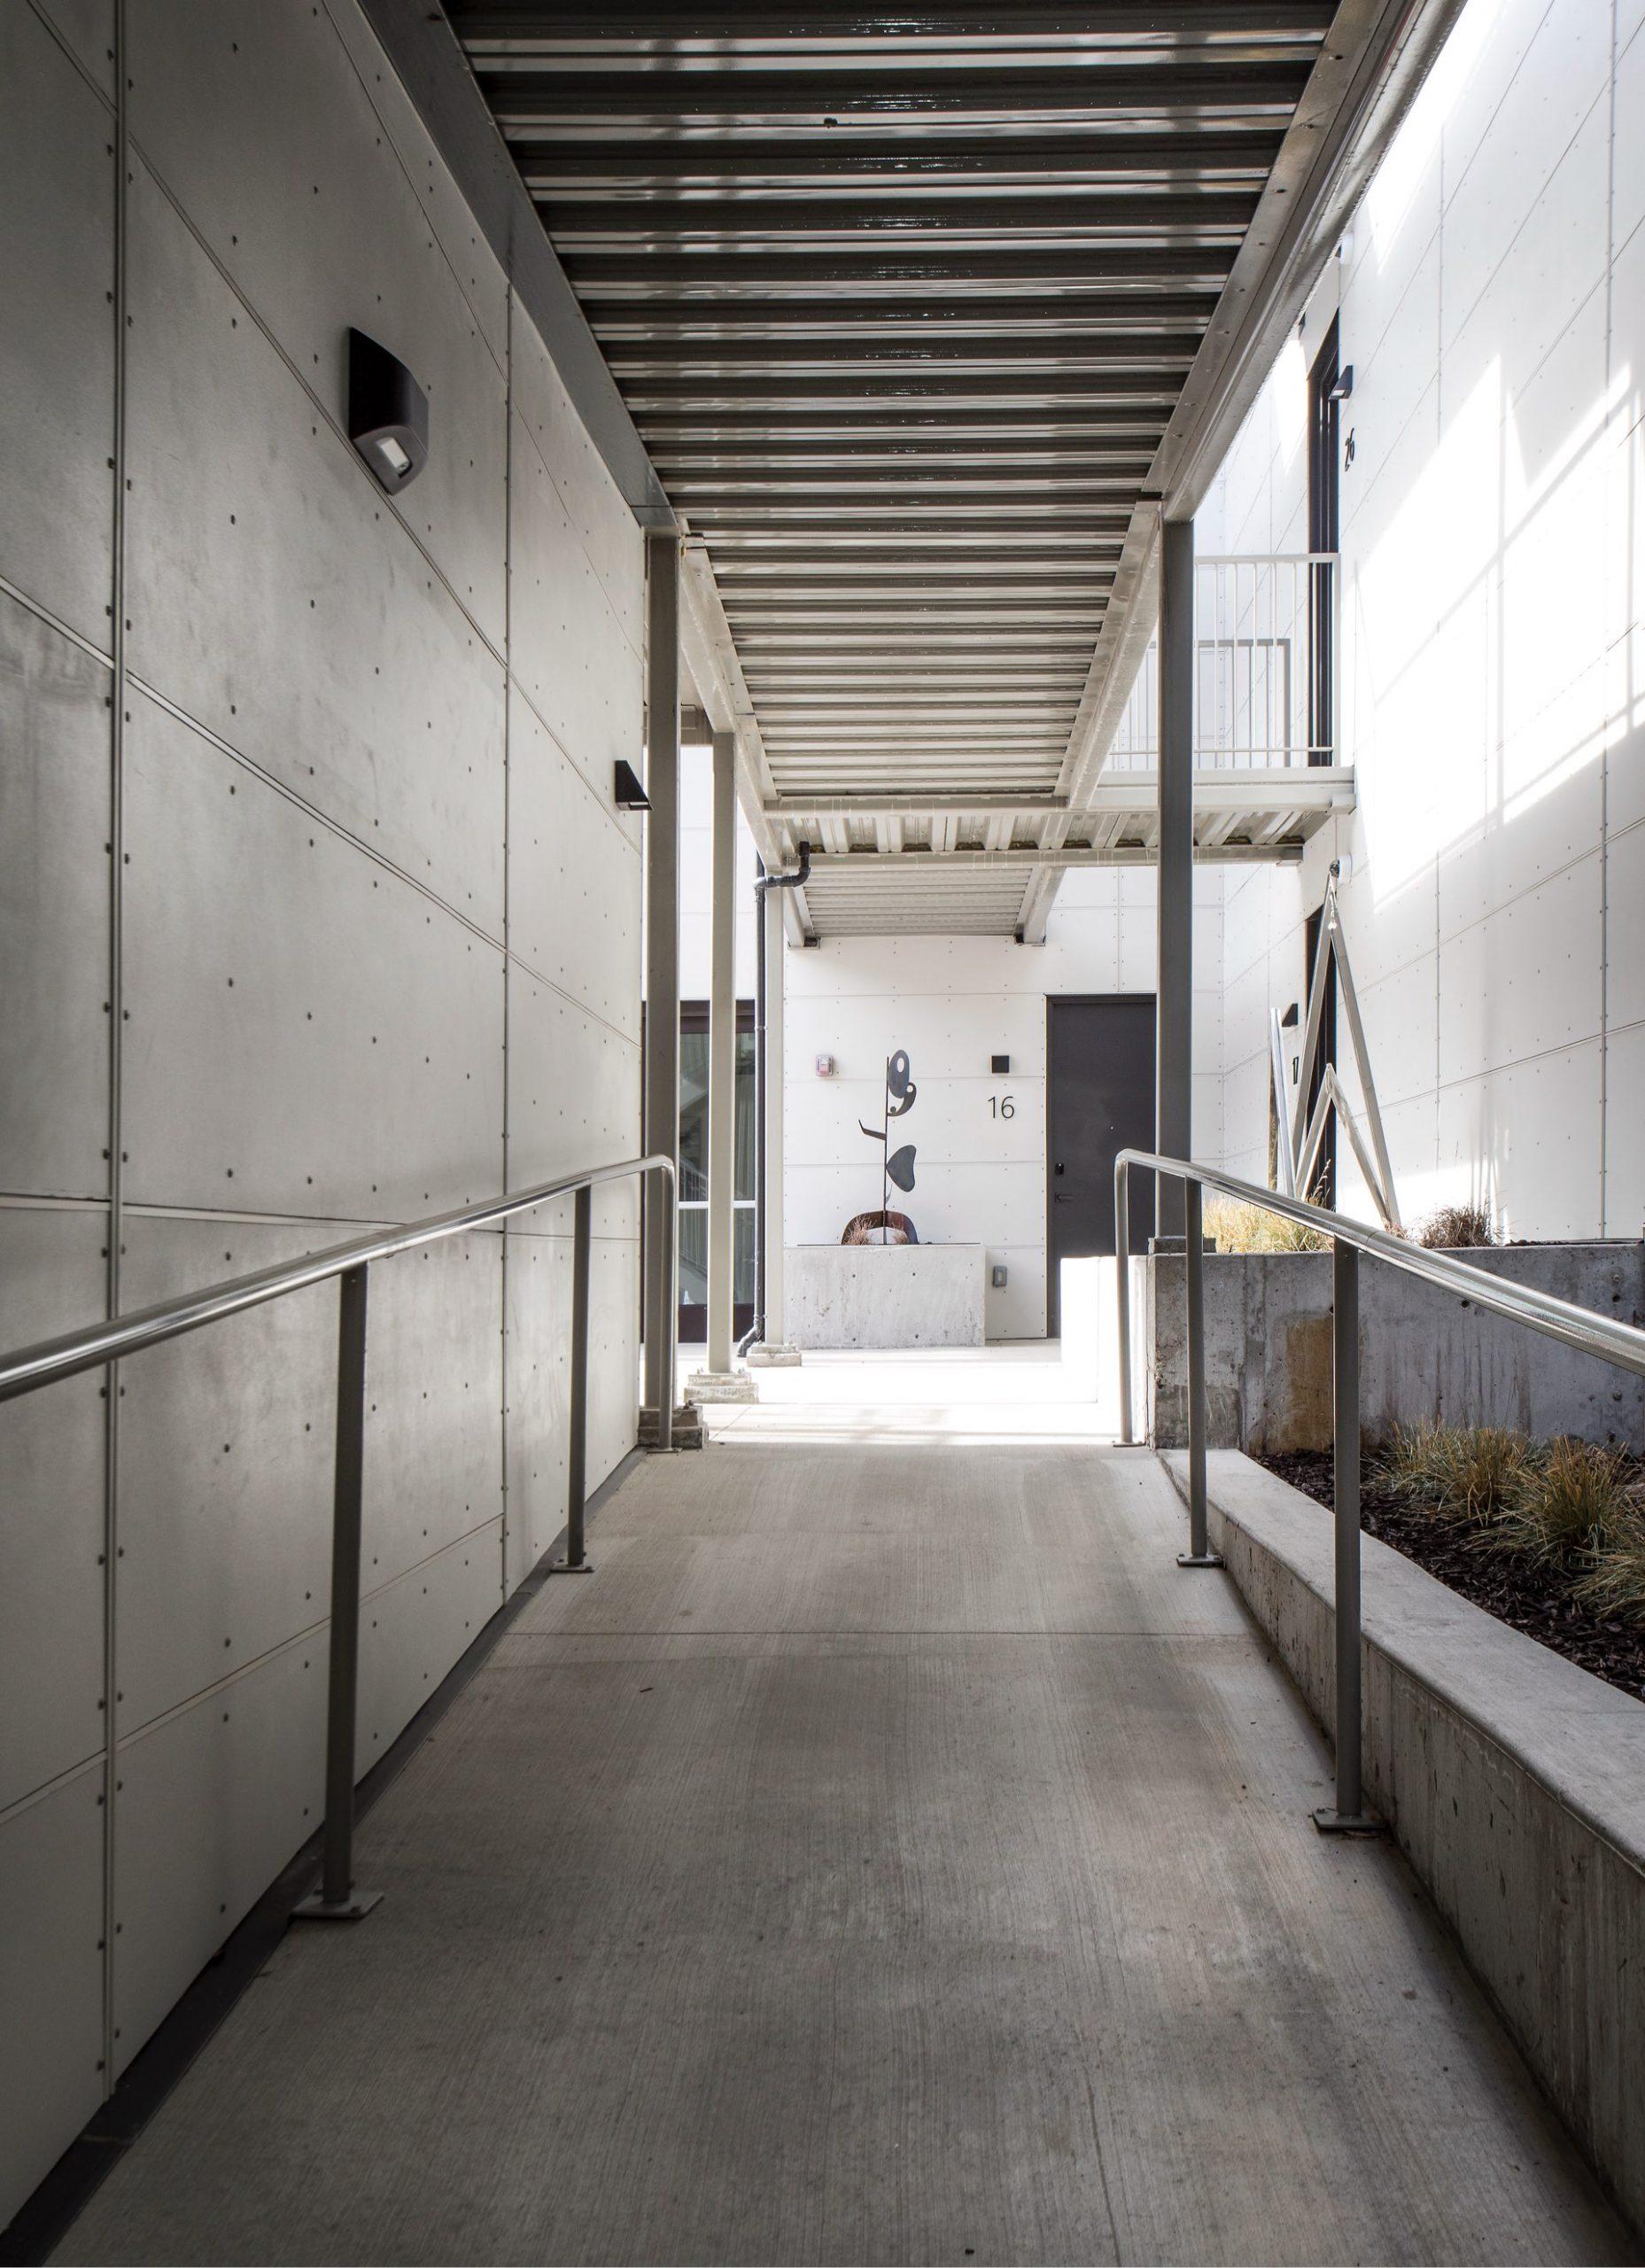 Exterior hallway, Prospector Residential, architectural design by Elliott Workgroup